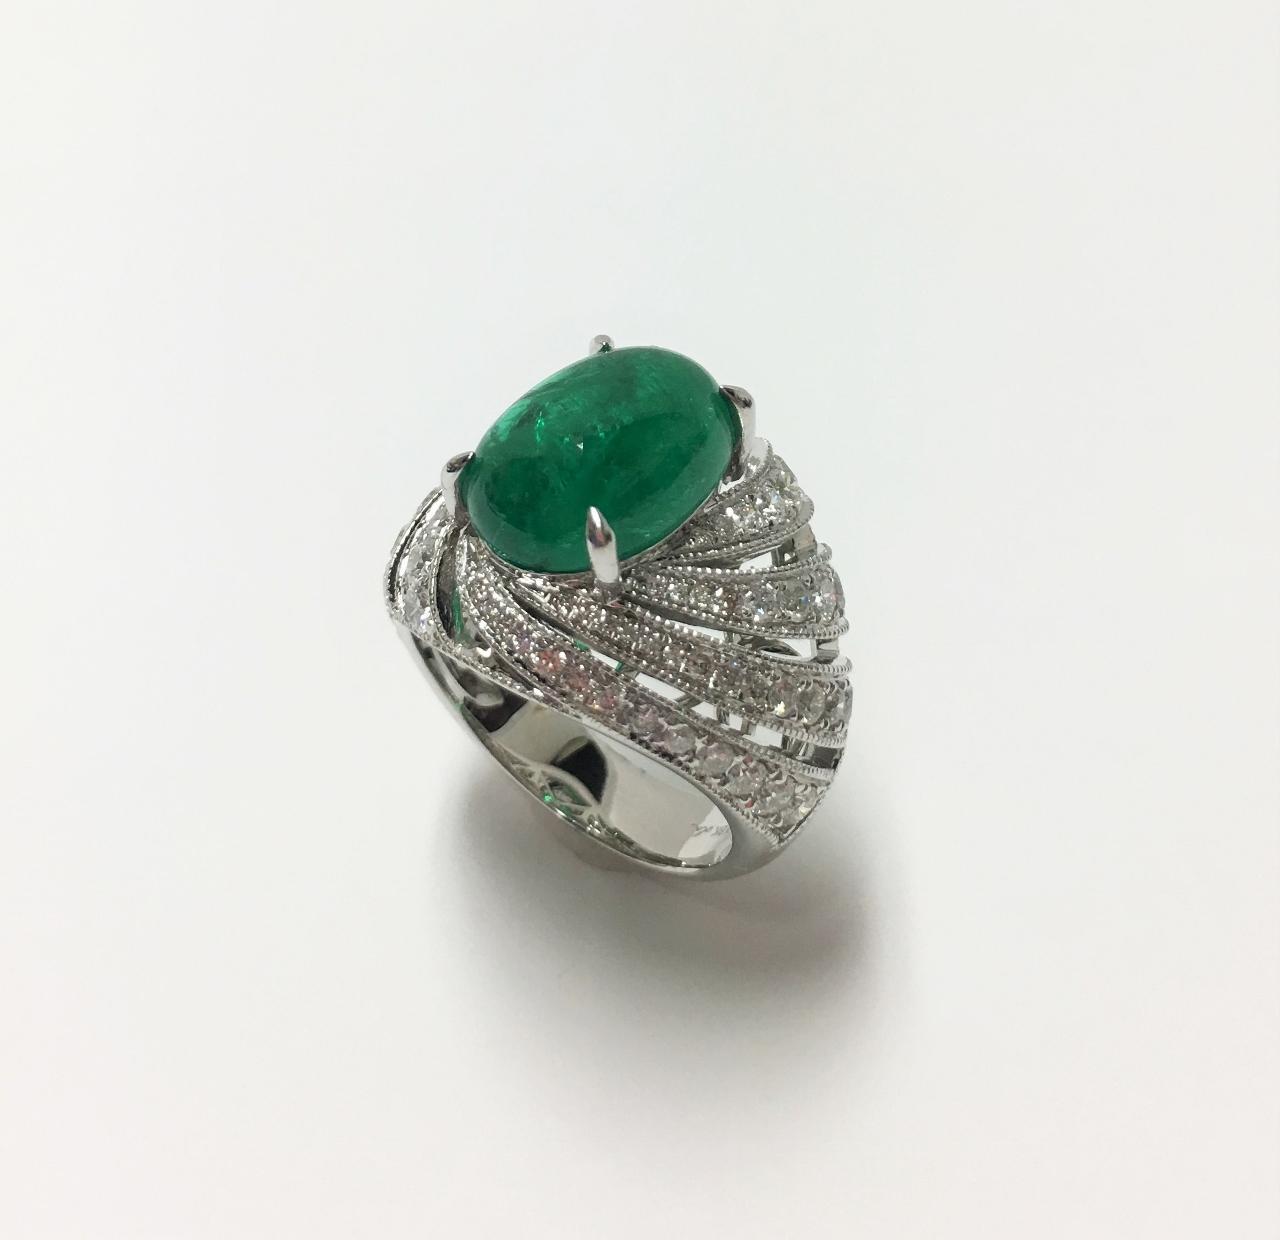 Over 4.5 Carats Cabochon Emerald Diamond Ring